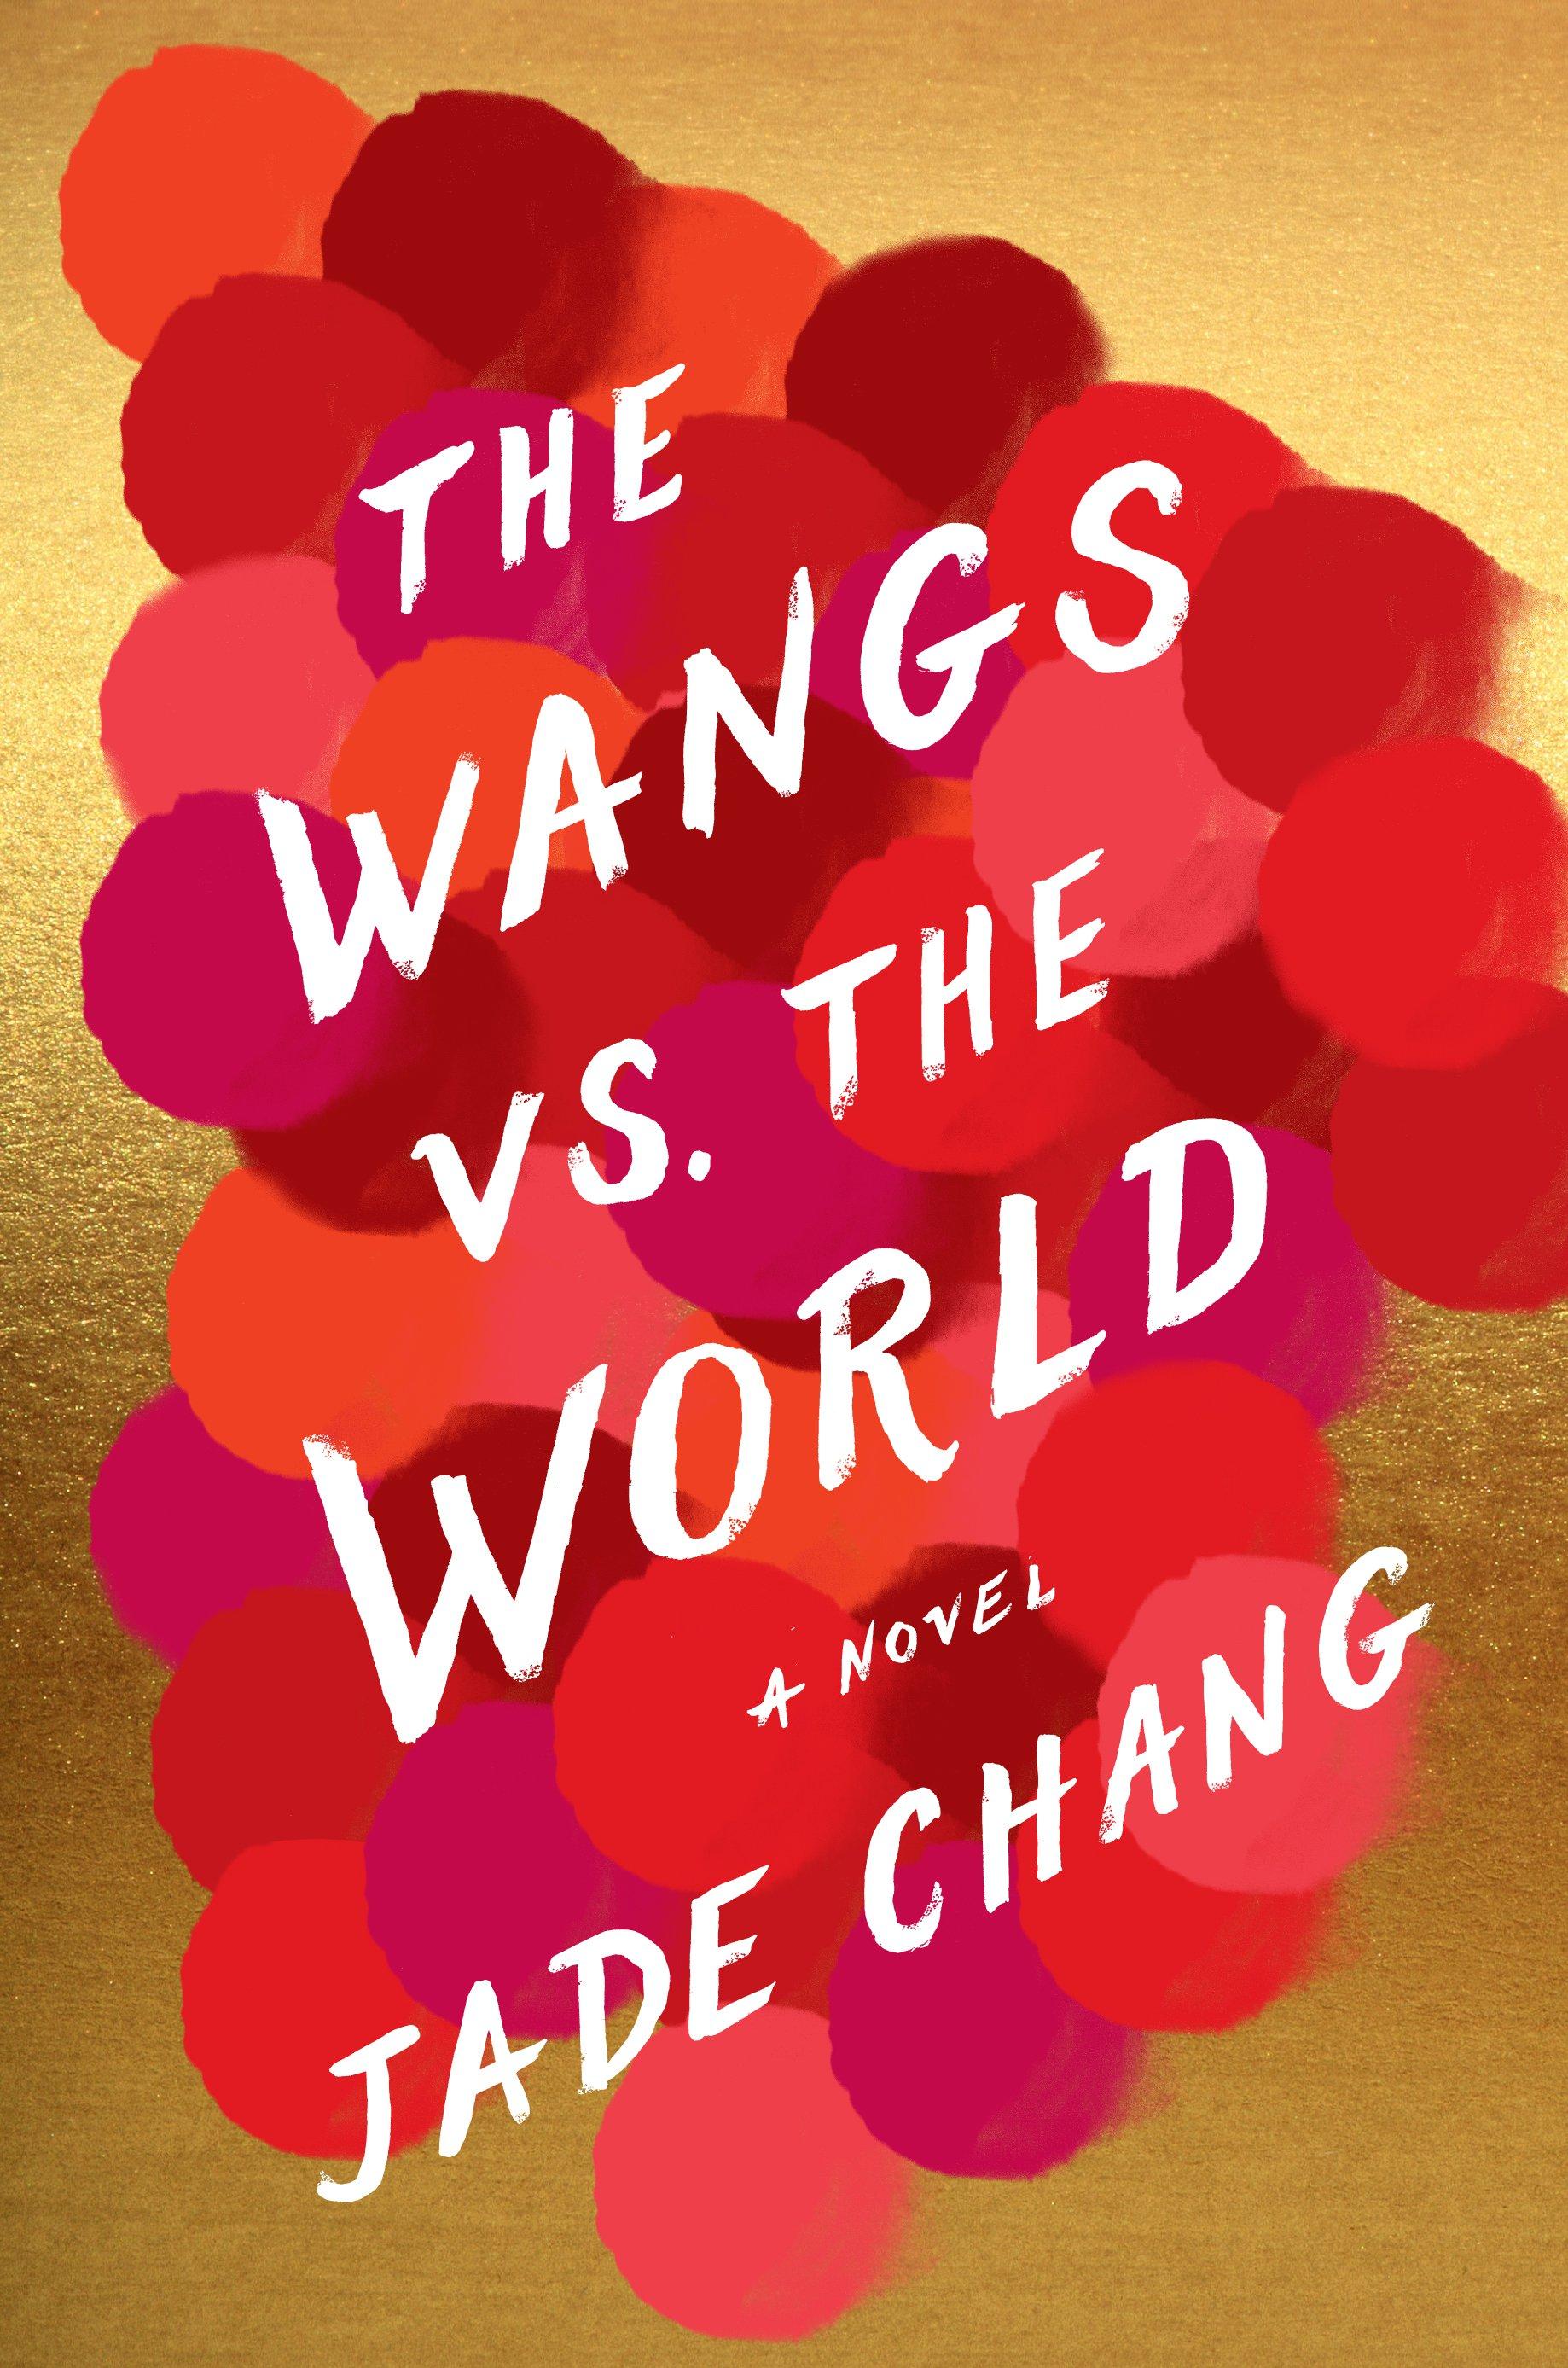 Wangs-vs-World-Jade-Chang-Out-Oct-4.jpg